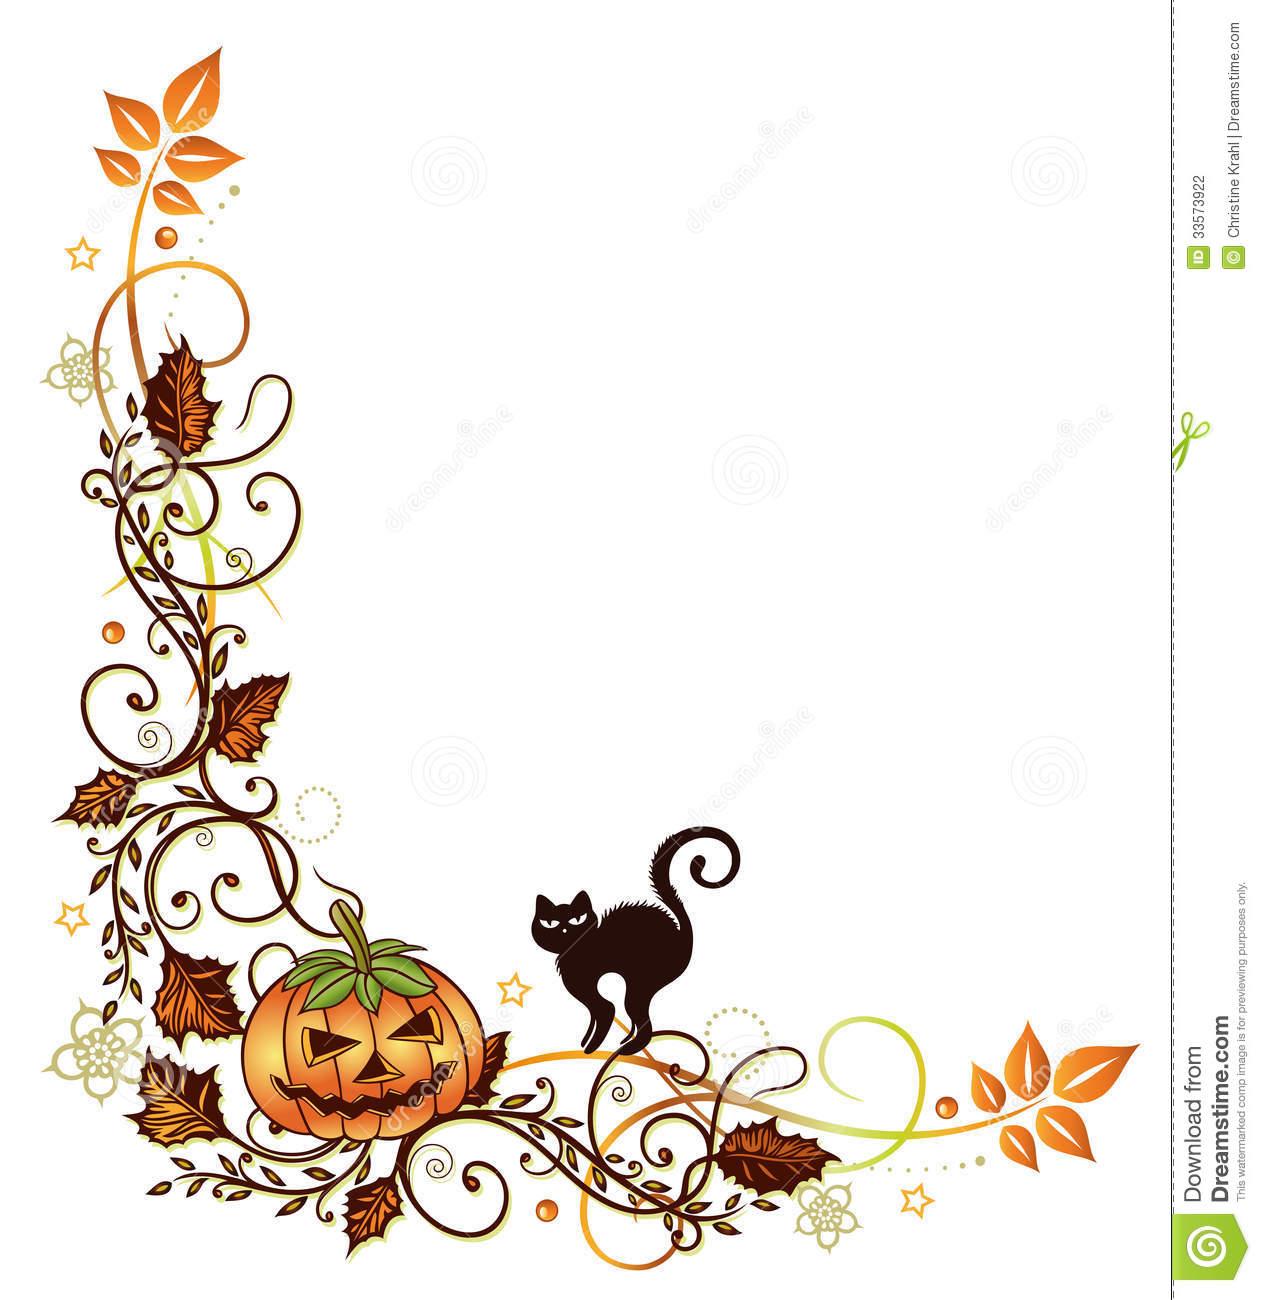 Pumpkin Border Black And White Clipart.